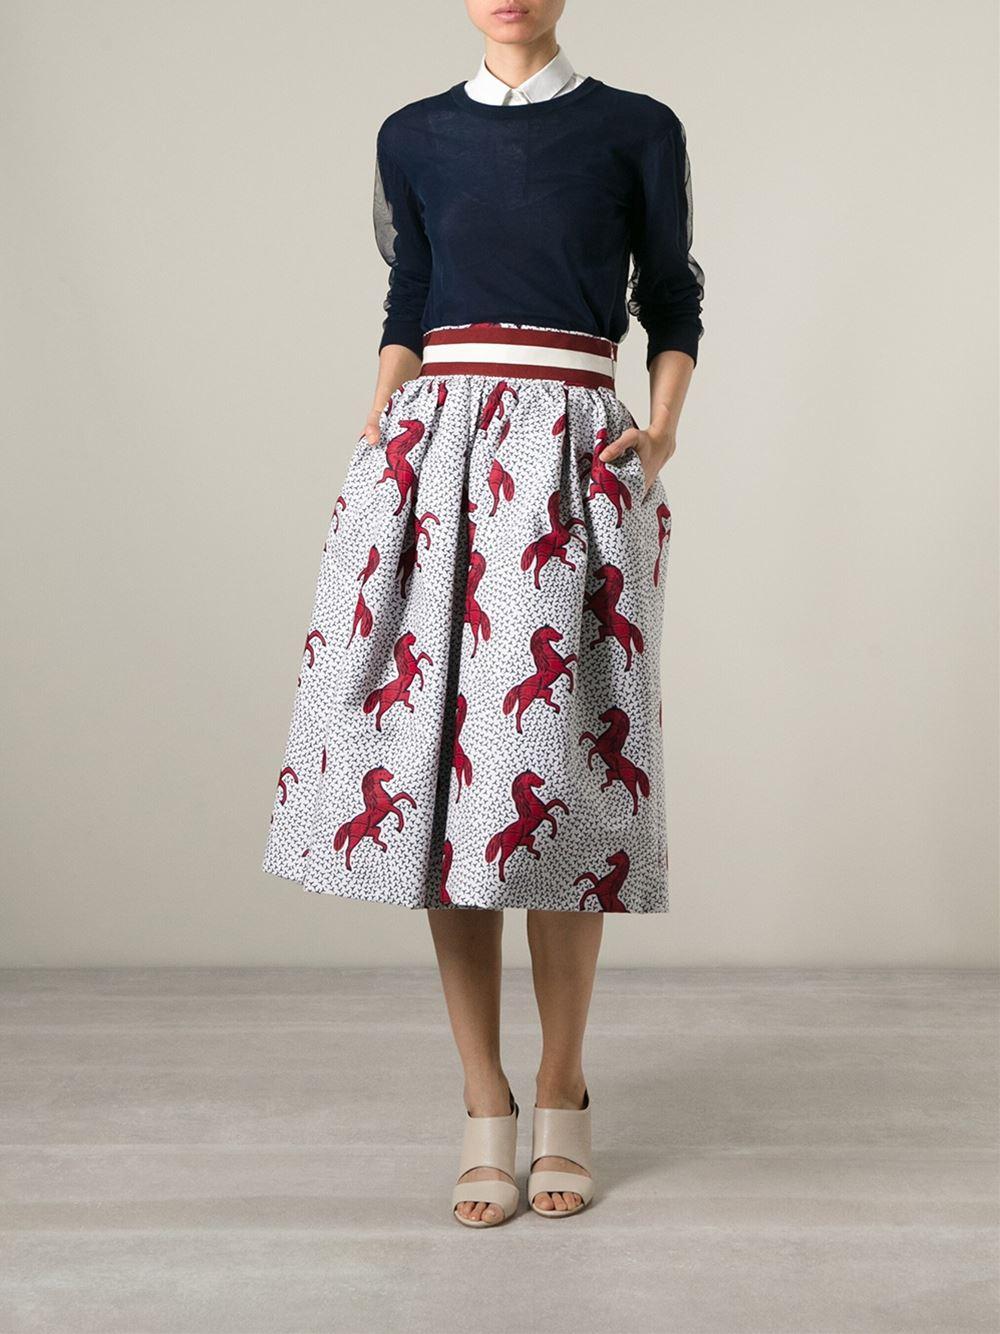 75078ffbd9 Stella Jean 'Pipistrello' Horse Print Pouf Skirt in White - Lyst